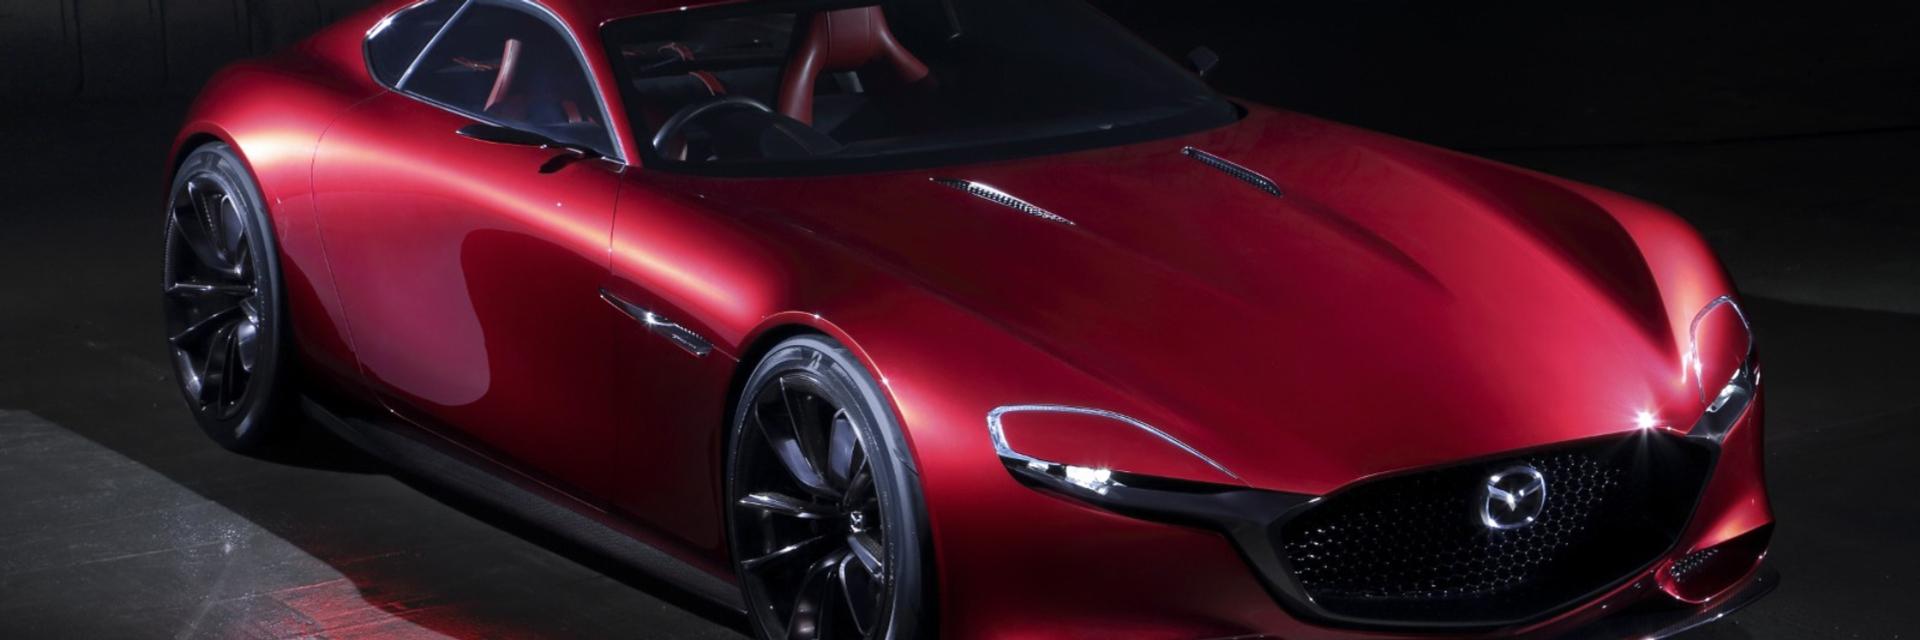 Mazda RX-Vision GT3 Concept 電玩虛擬賽車將在明年推出